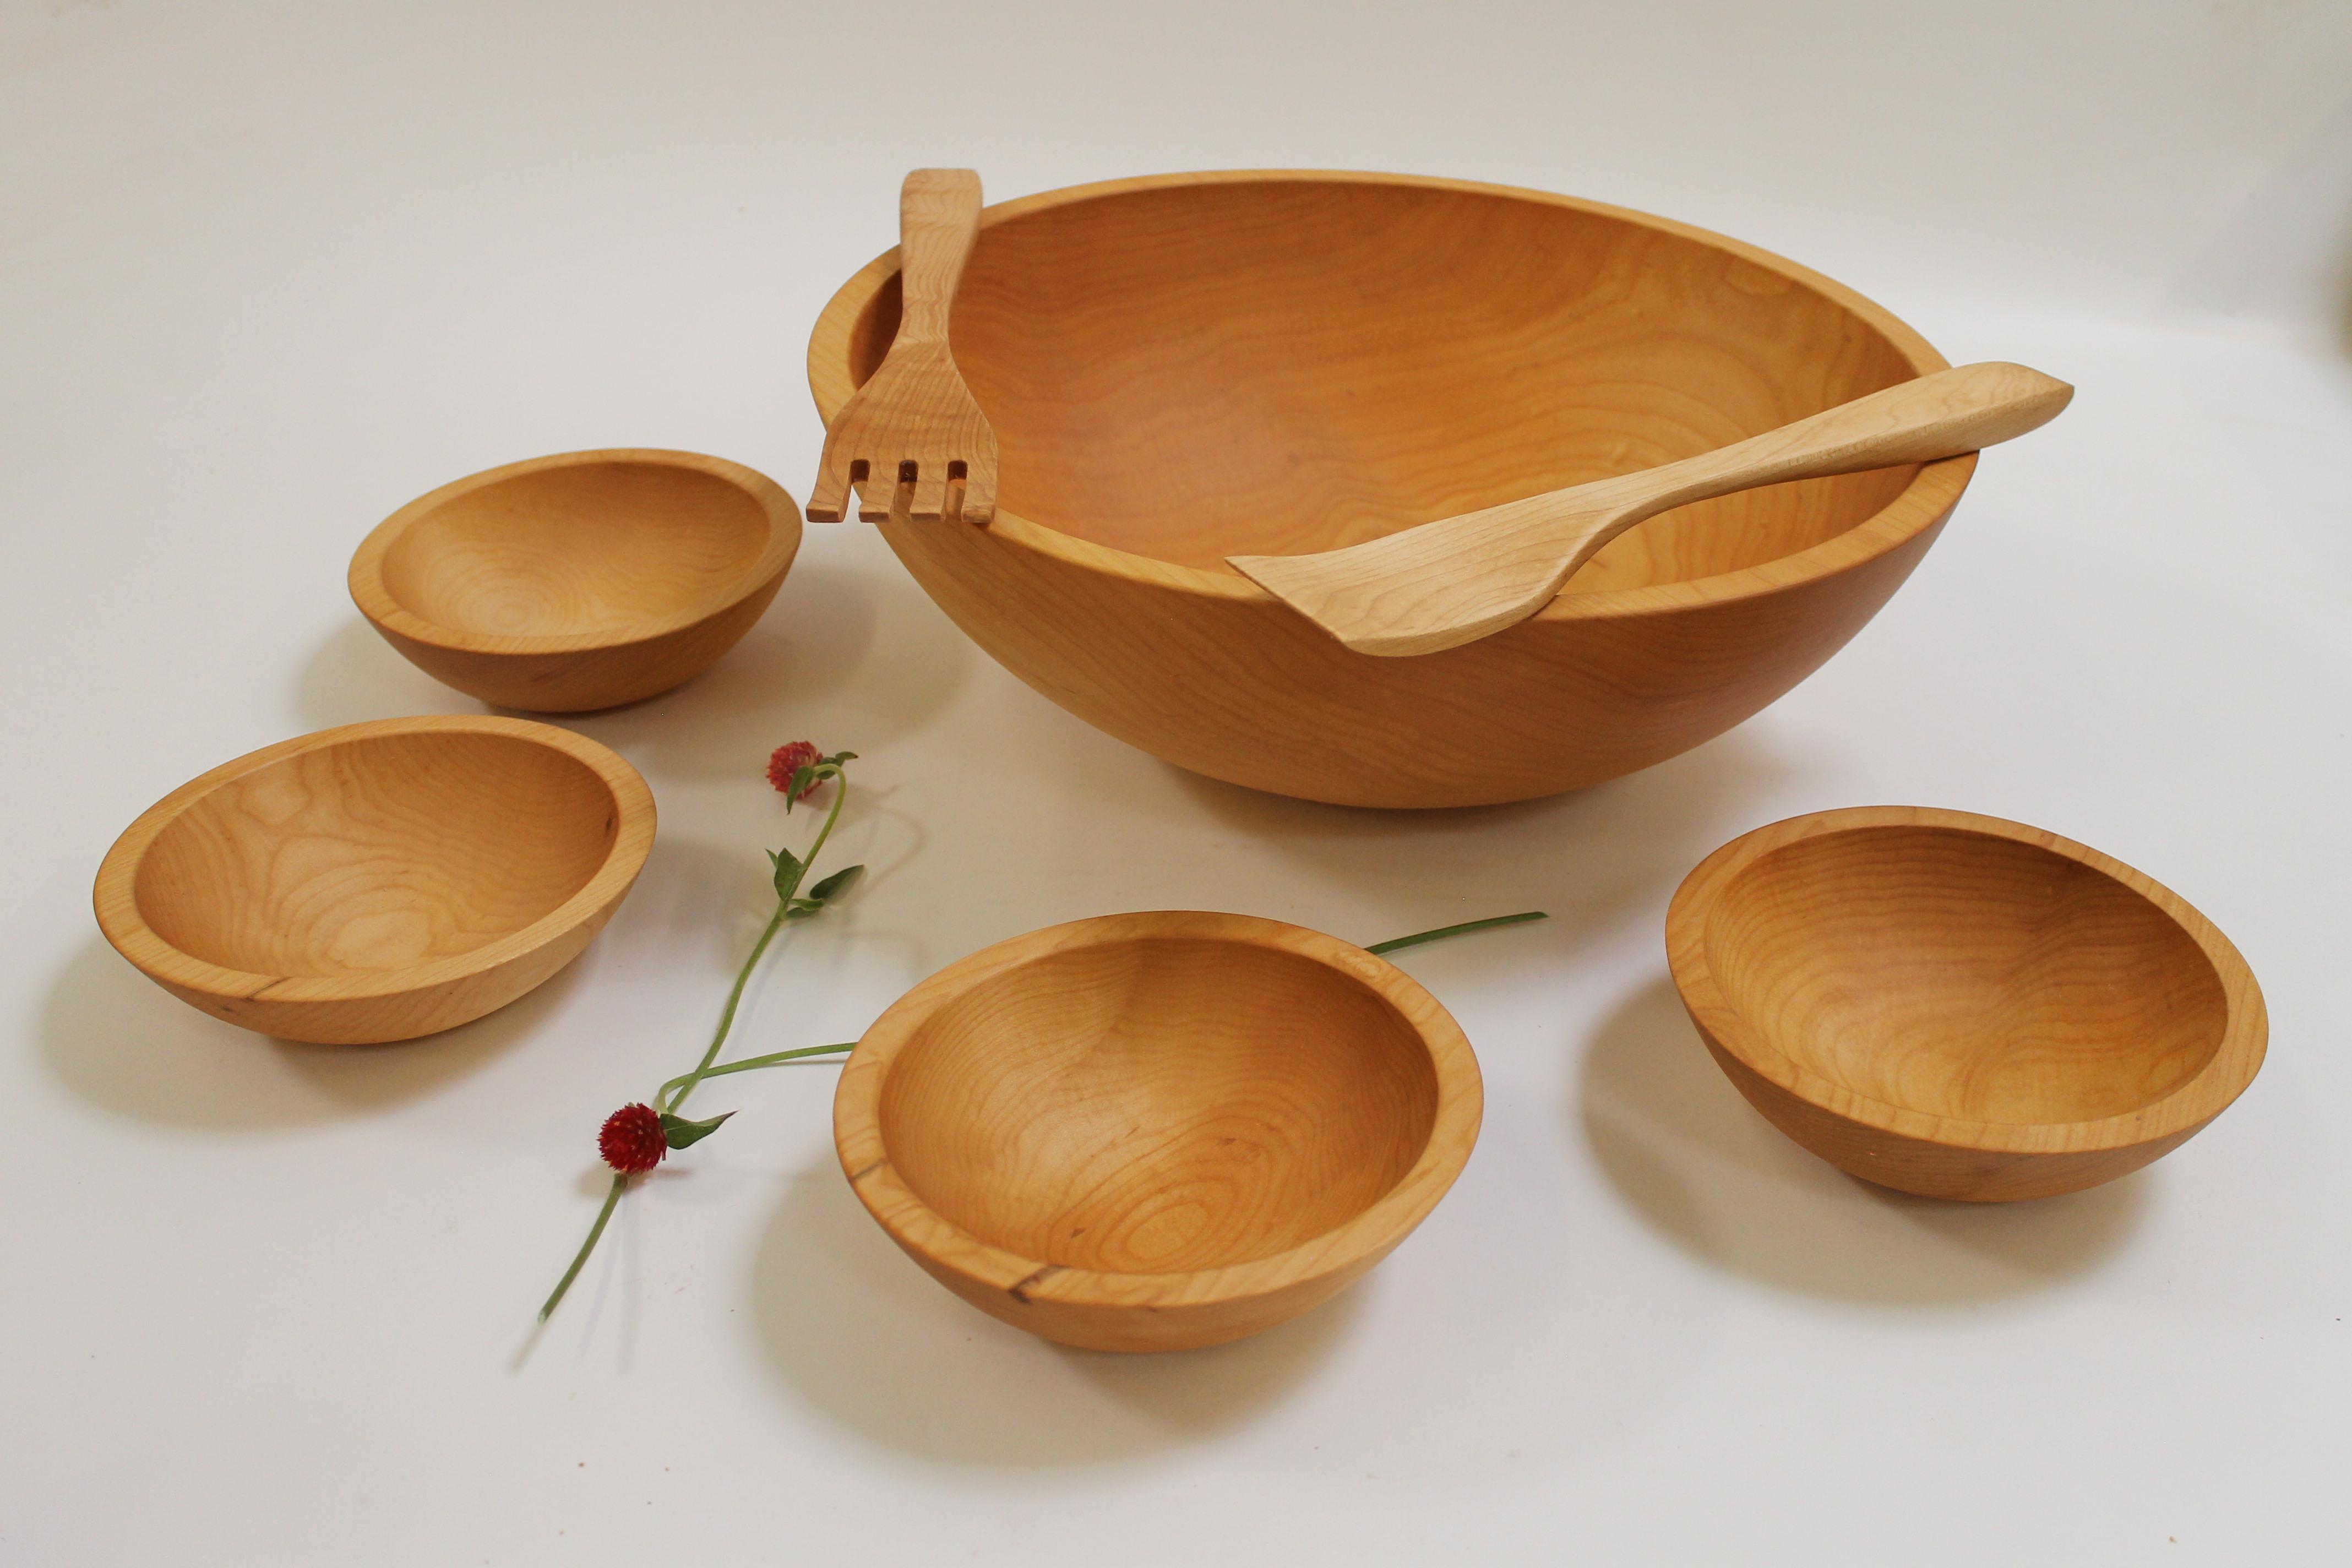 17 inch Maple Salad Bowl Set - Bee's Oil Finish M117B-5S